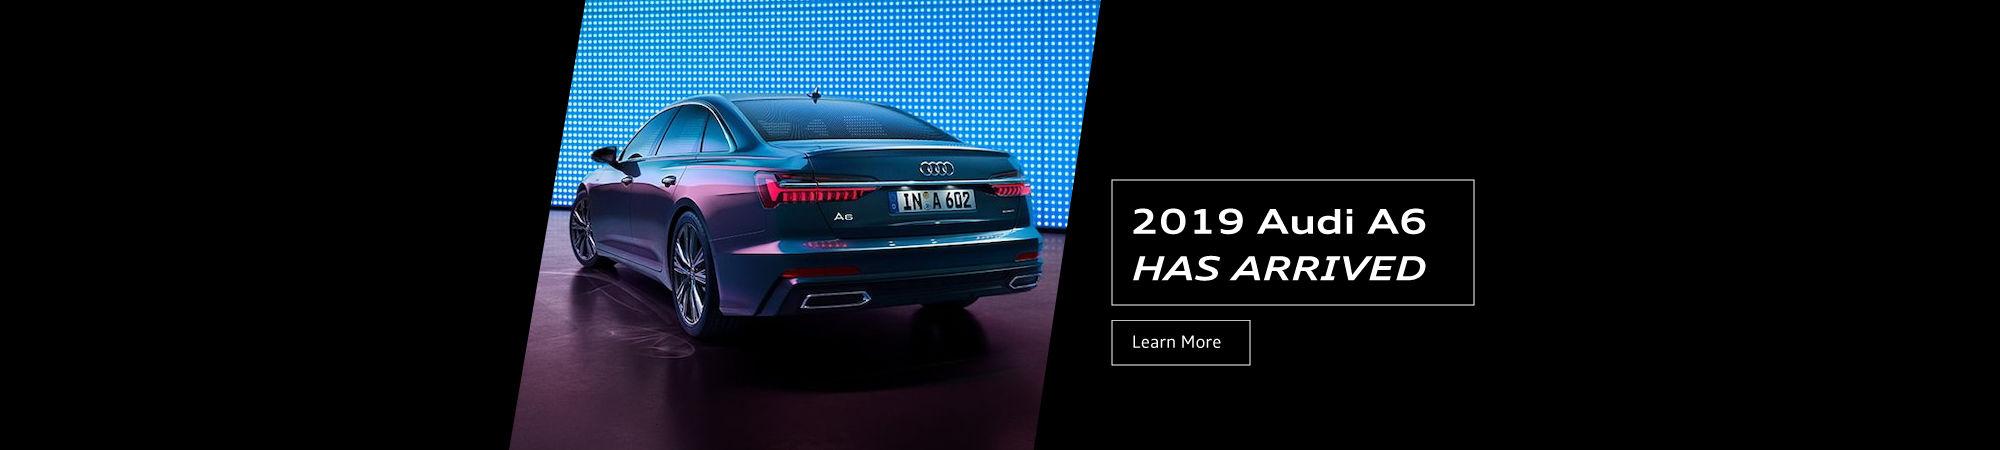 2019 Audi A6 Sedan Has Arrived